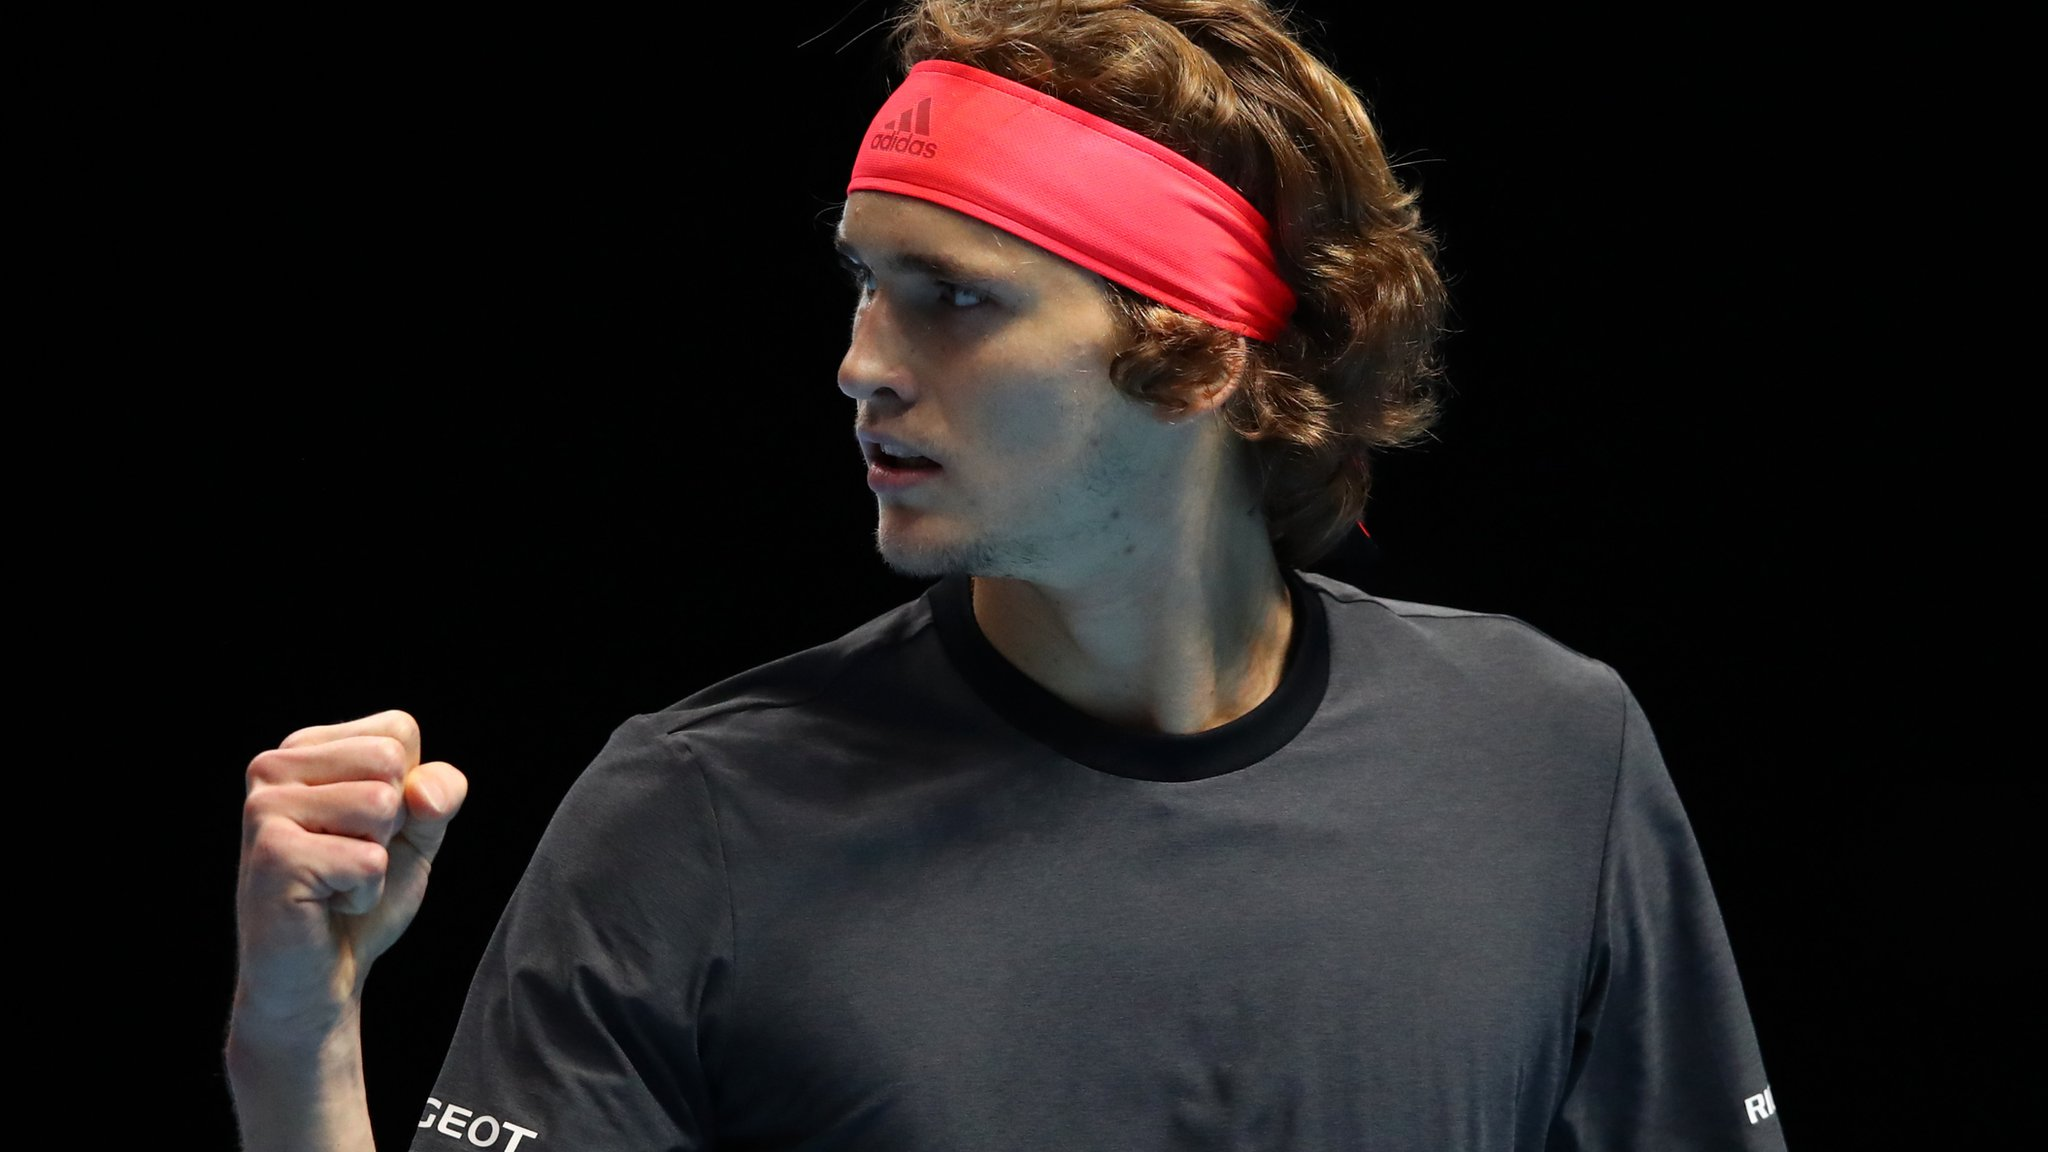 ATP Finals: Roger Federer beaten by Alexander Zverev in semi-finals